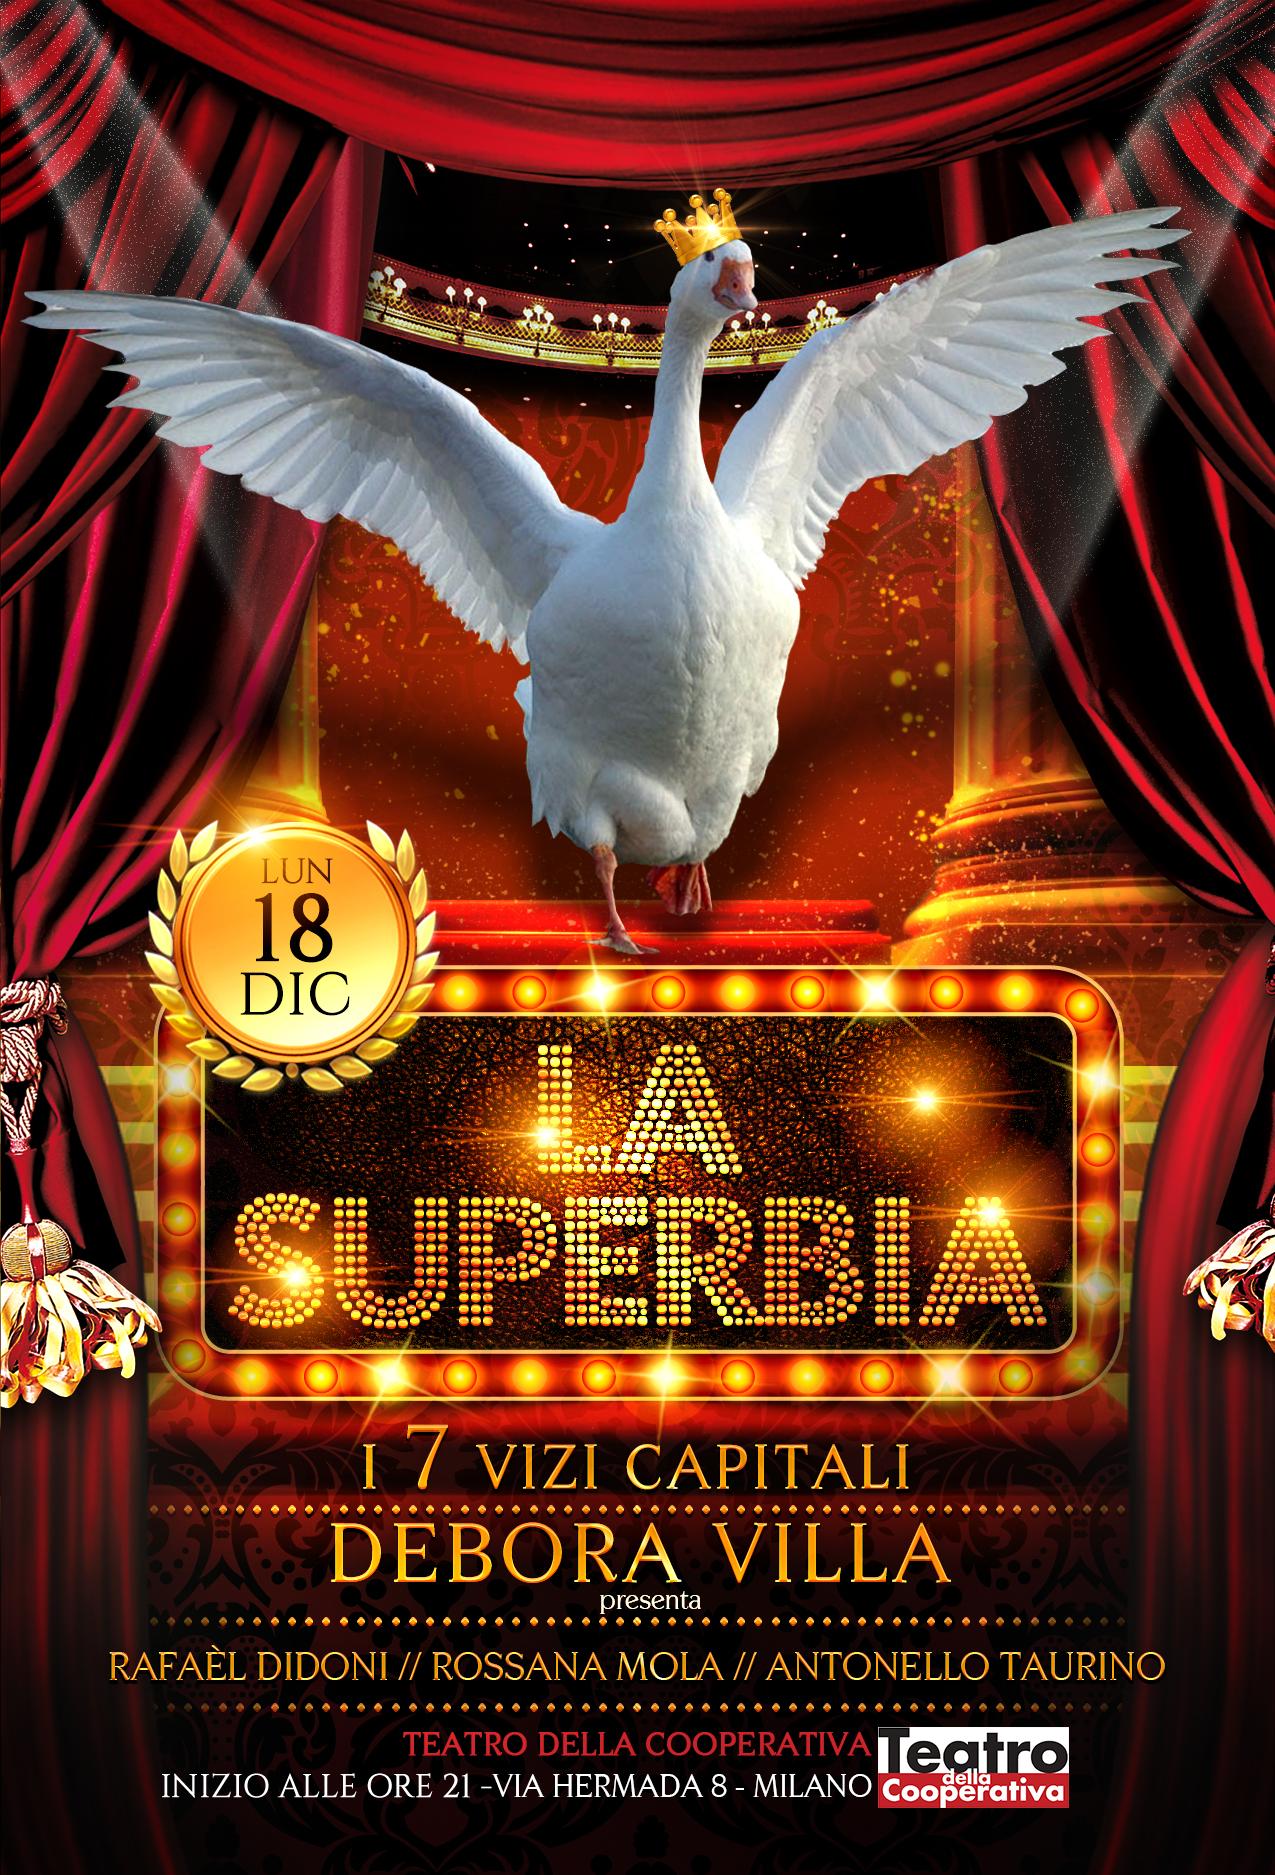 corso_teatrale_debora_villa_teatro_della_cooperativa